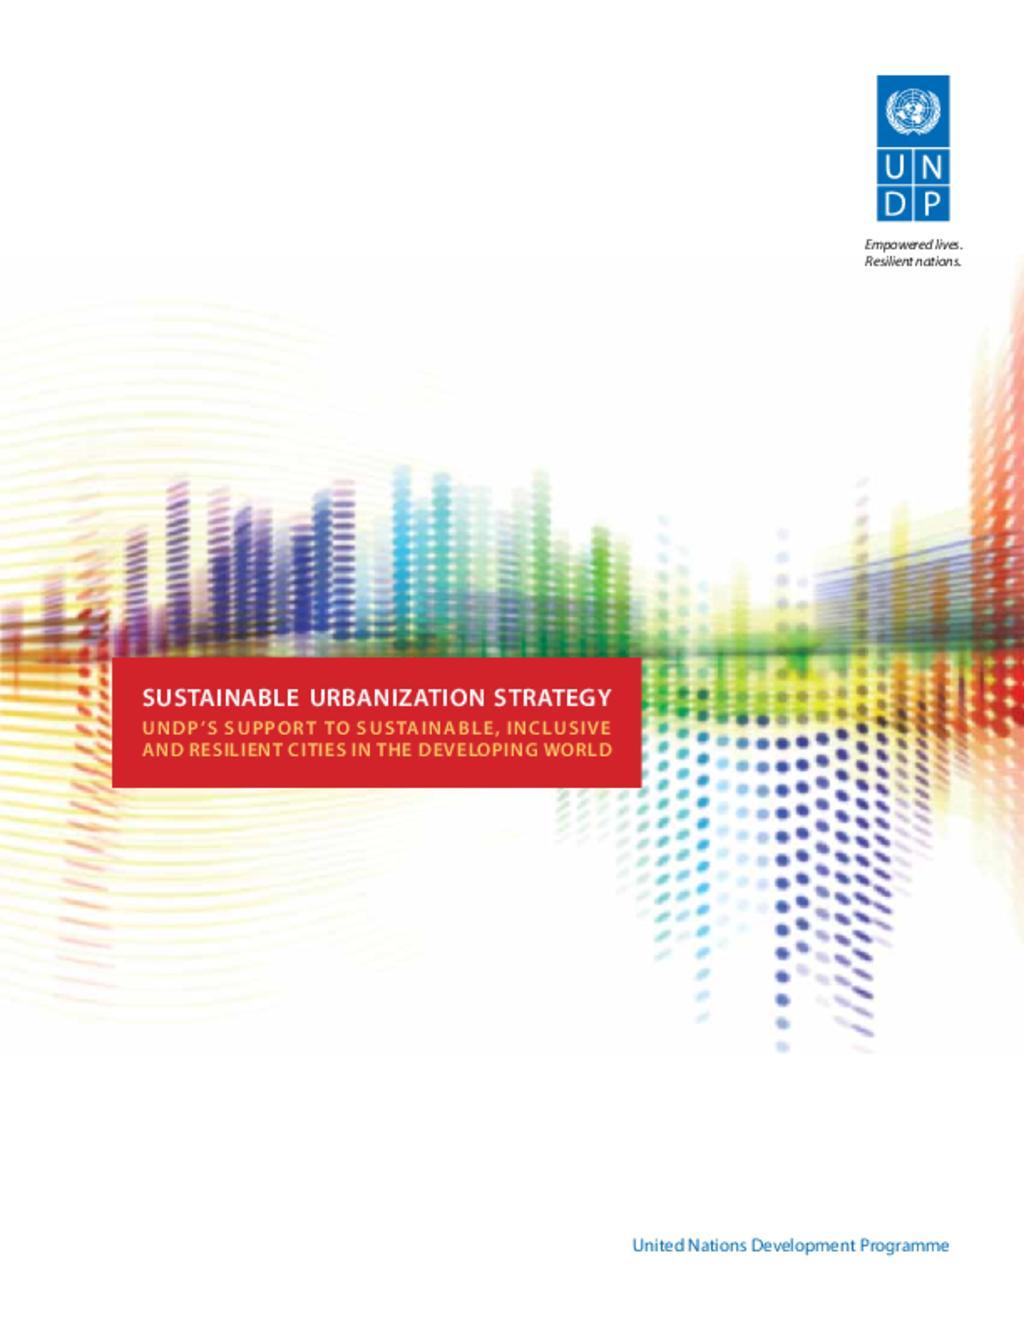 UNDP urban Strategy